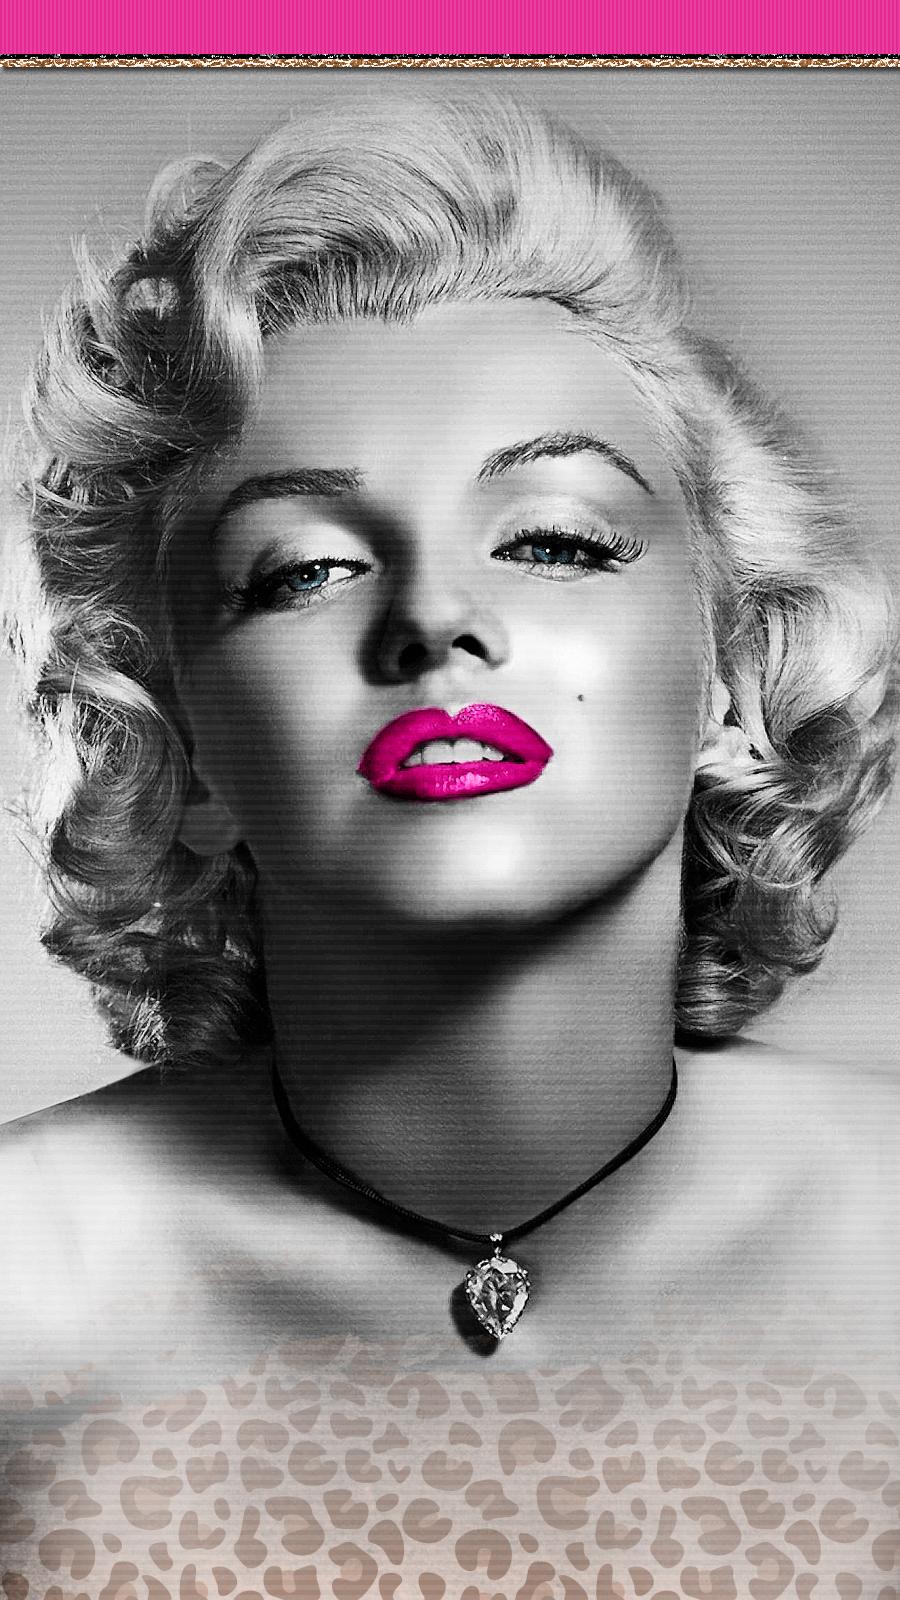 Marilyn Monroe Wallpaper High Resolution Festival Wallpaper Marilyn Monroe Portrait Marilyn Monroe Wallpaper Marilyn Monroe Artwork